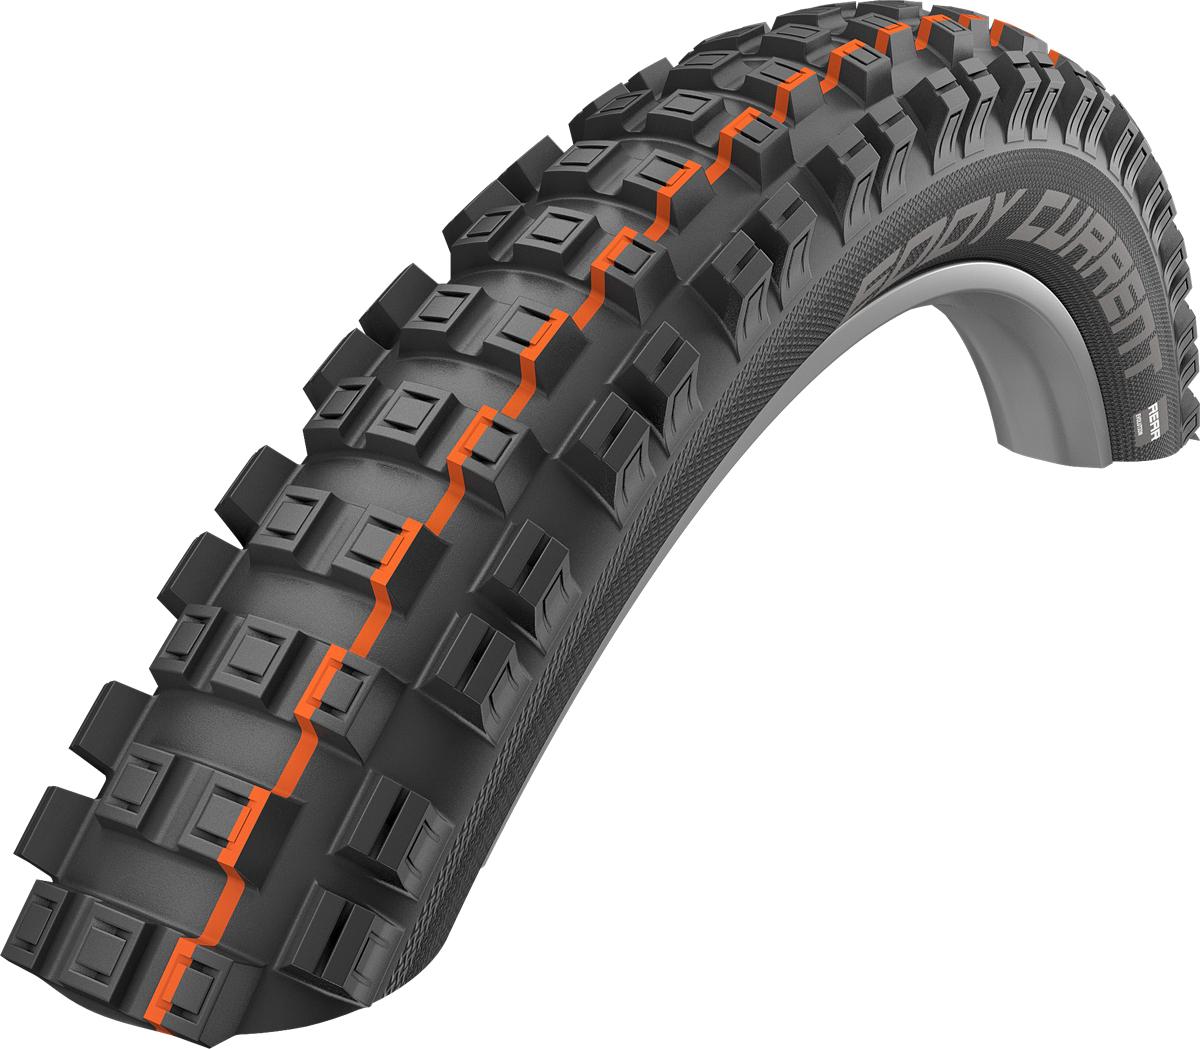 "Schwalbe Eddy Current Super Gravity Rear Folding E-MTB Tyre - 27.5"""